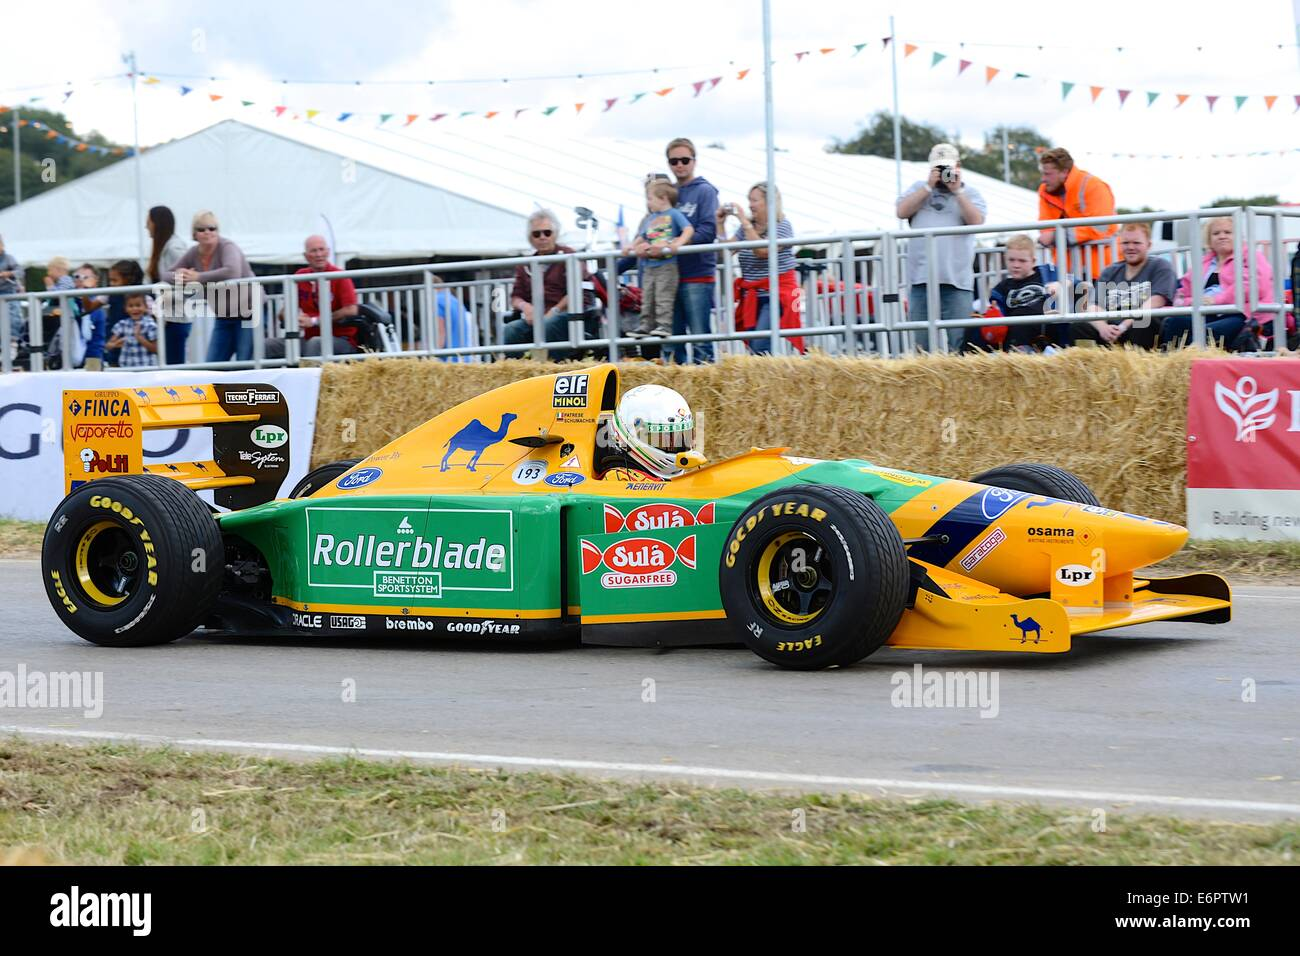 Camel Lotus Type 101 Formula 1 Car At Chris Evans Carfest